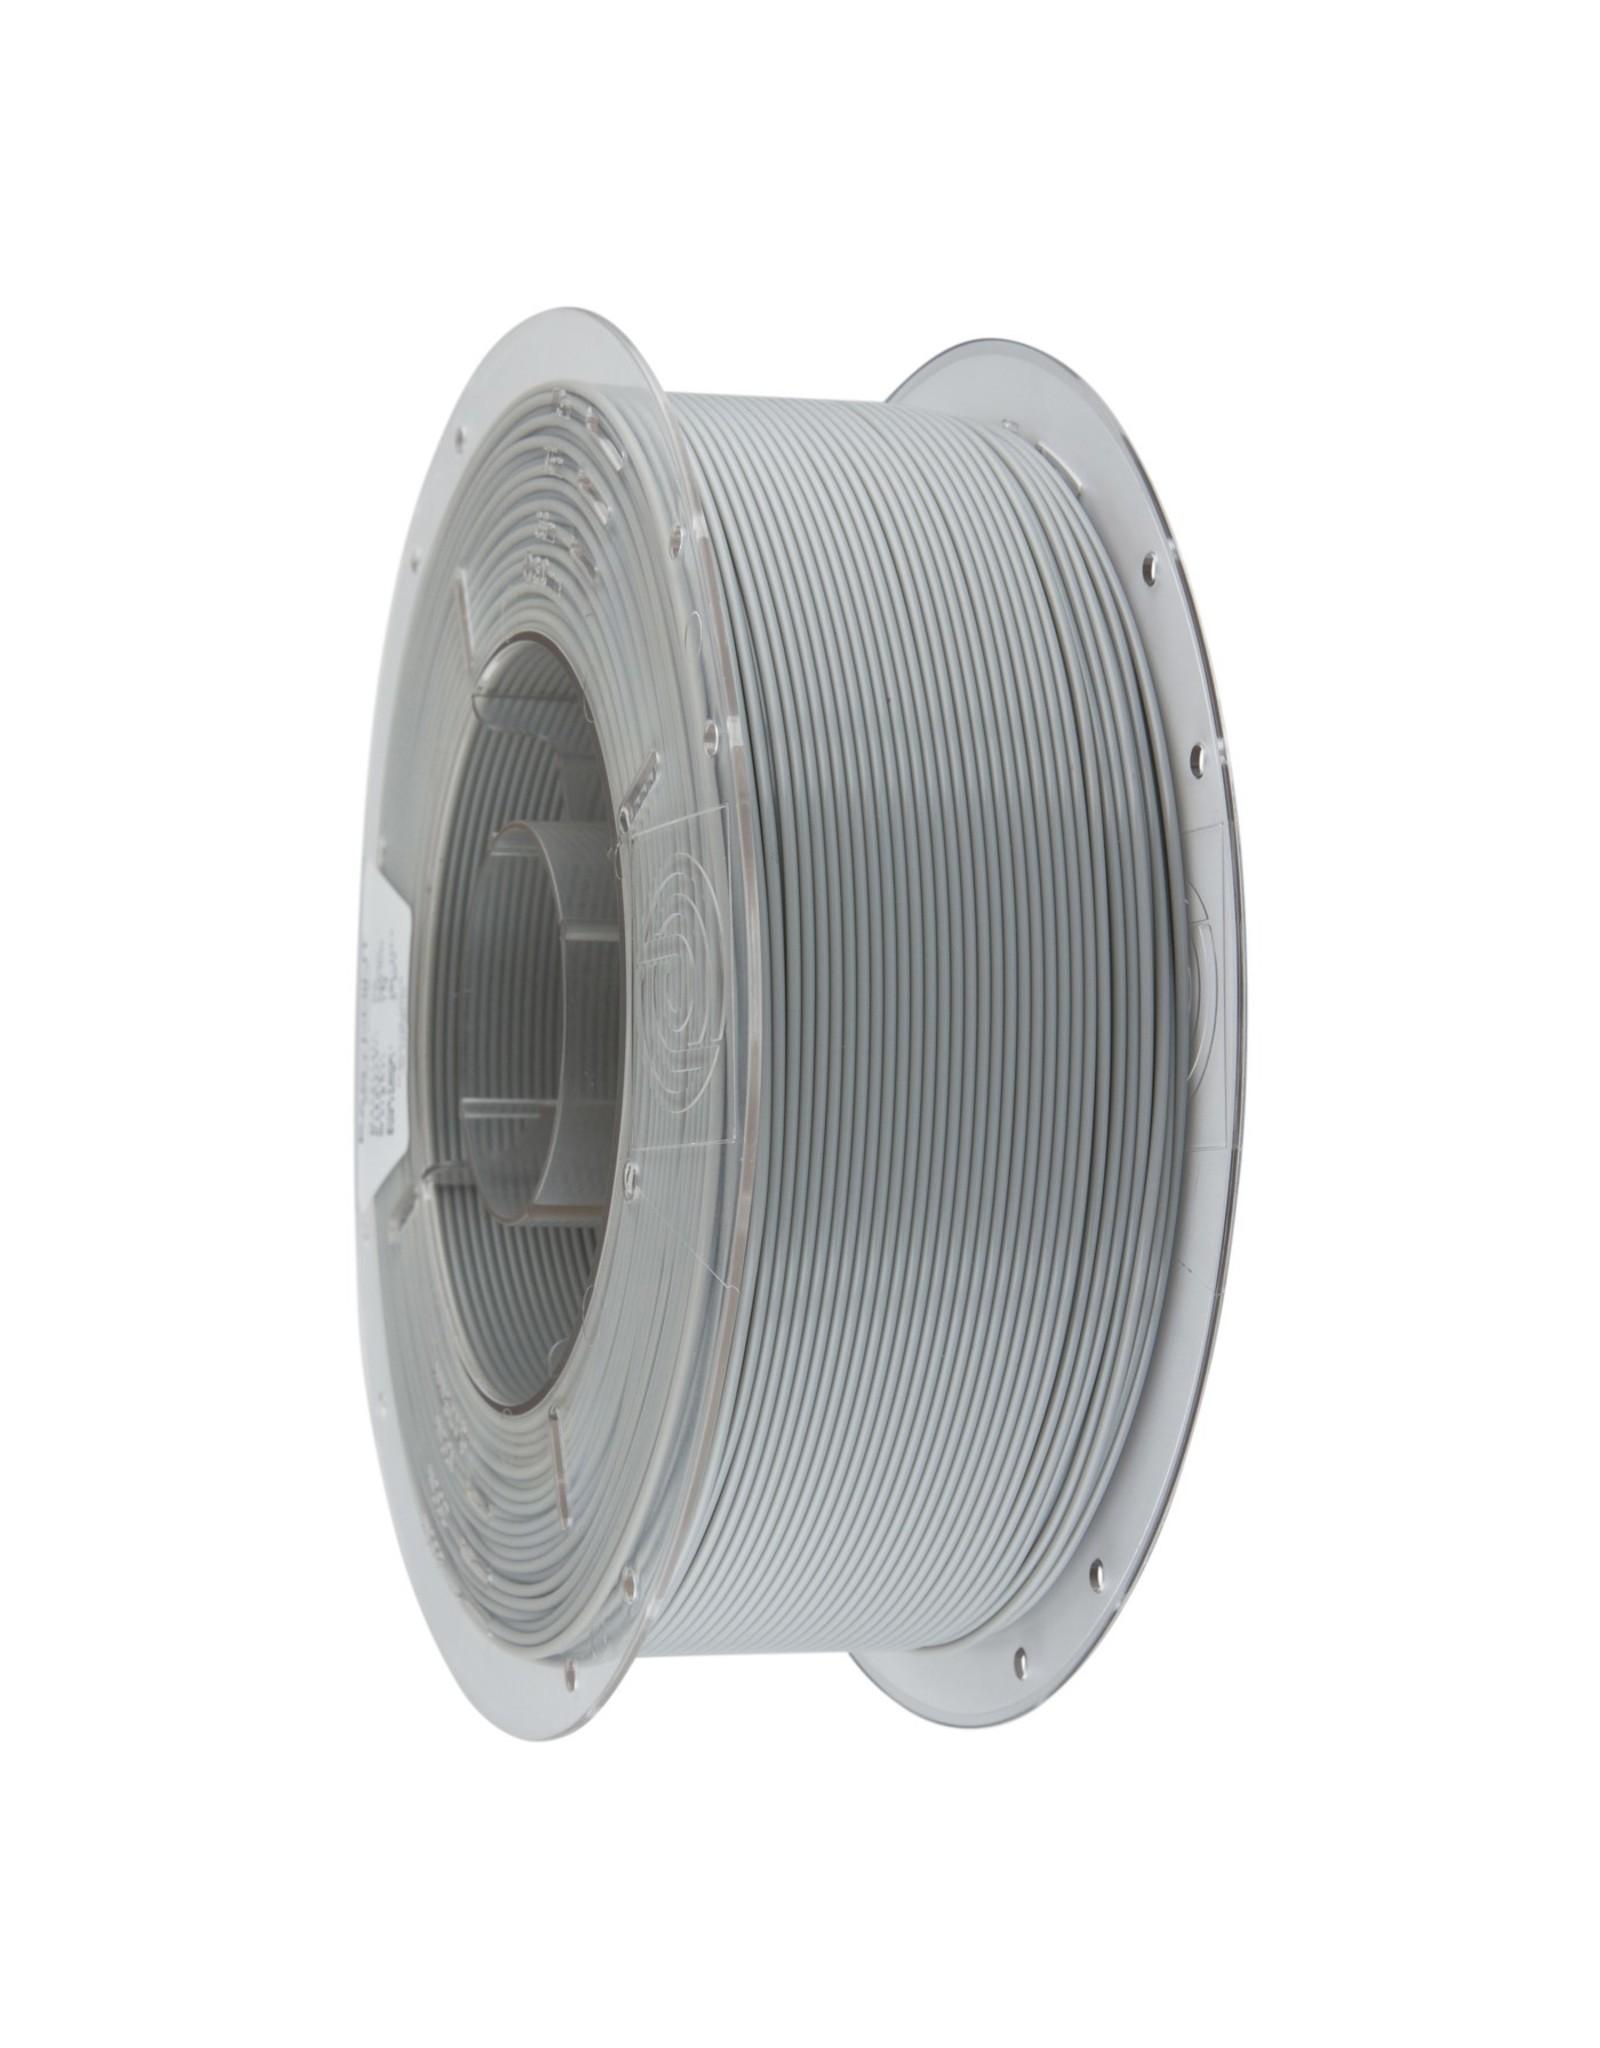 Prima Prima Easyprint PLA 1.75mm 1kg Gris clair